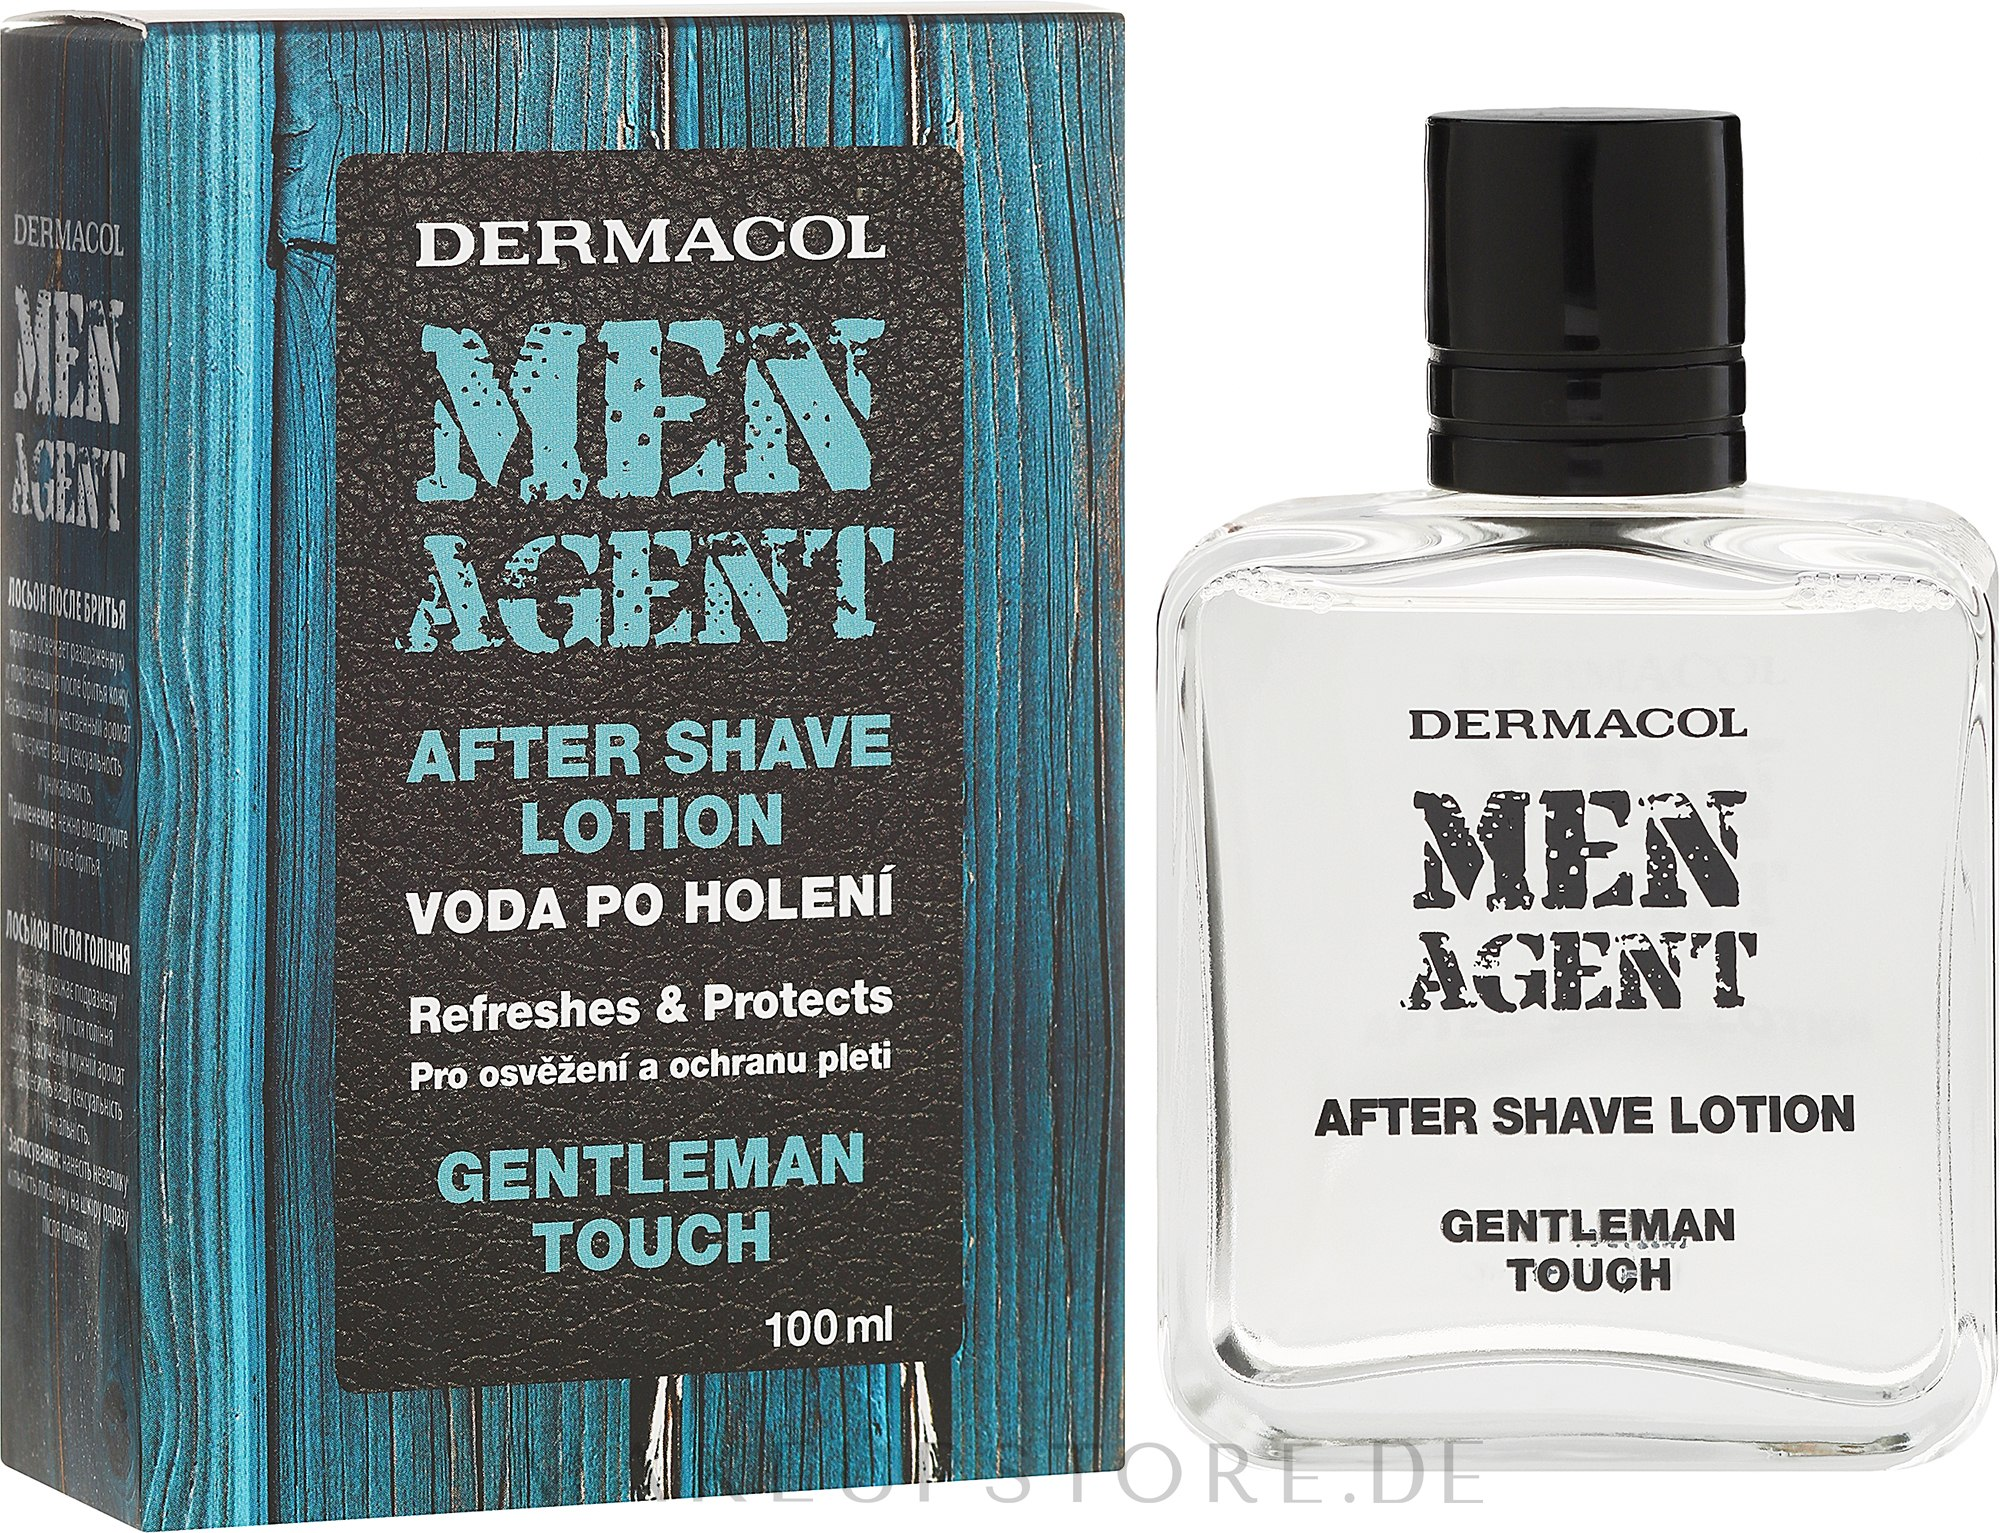 After Shave Lotion - Dermacol Men Agent After Shave Lotion Gentleman Touch — Bild 100 ml